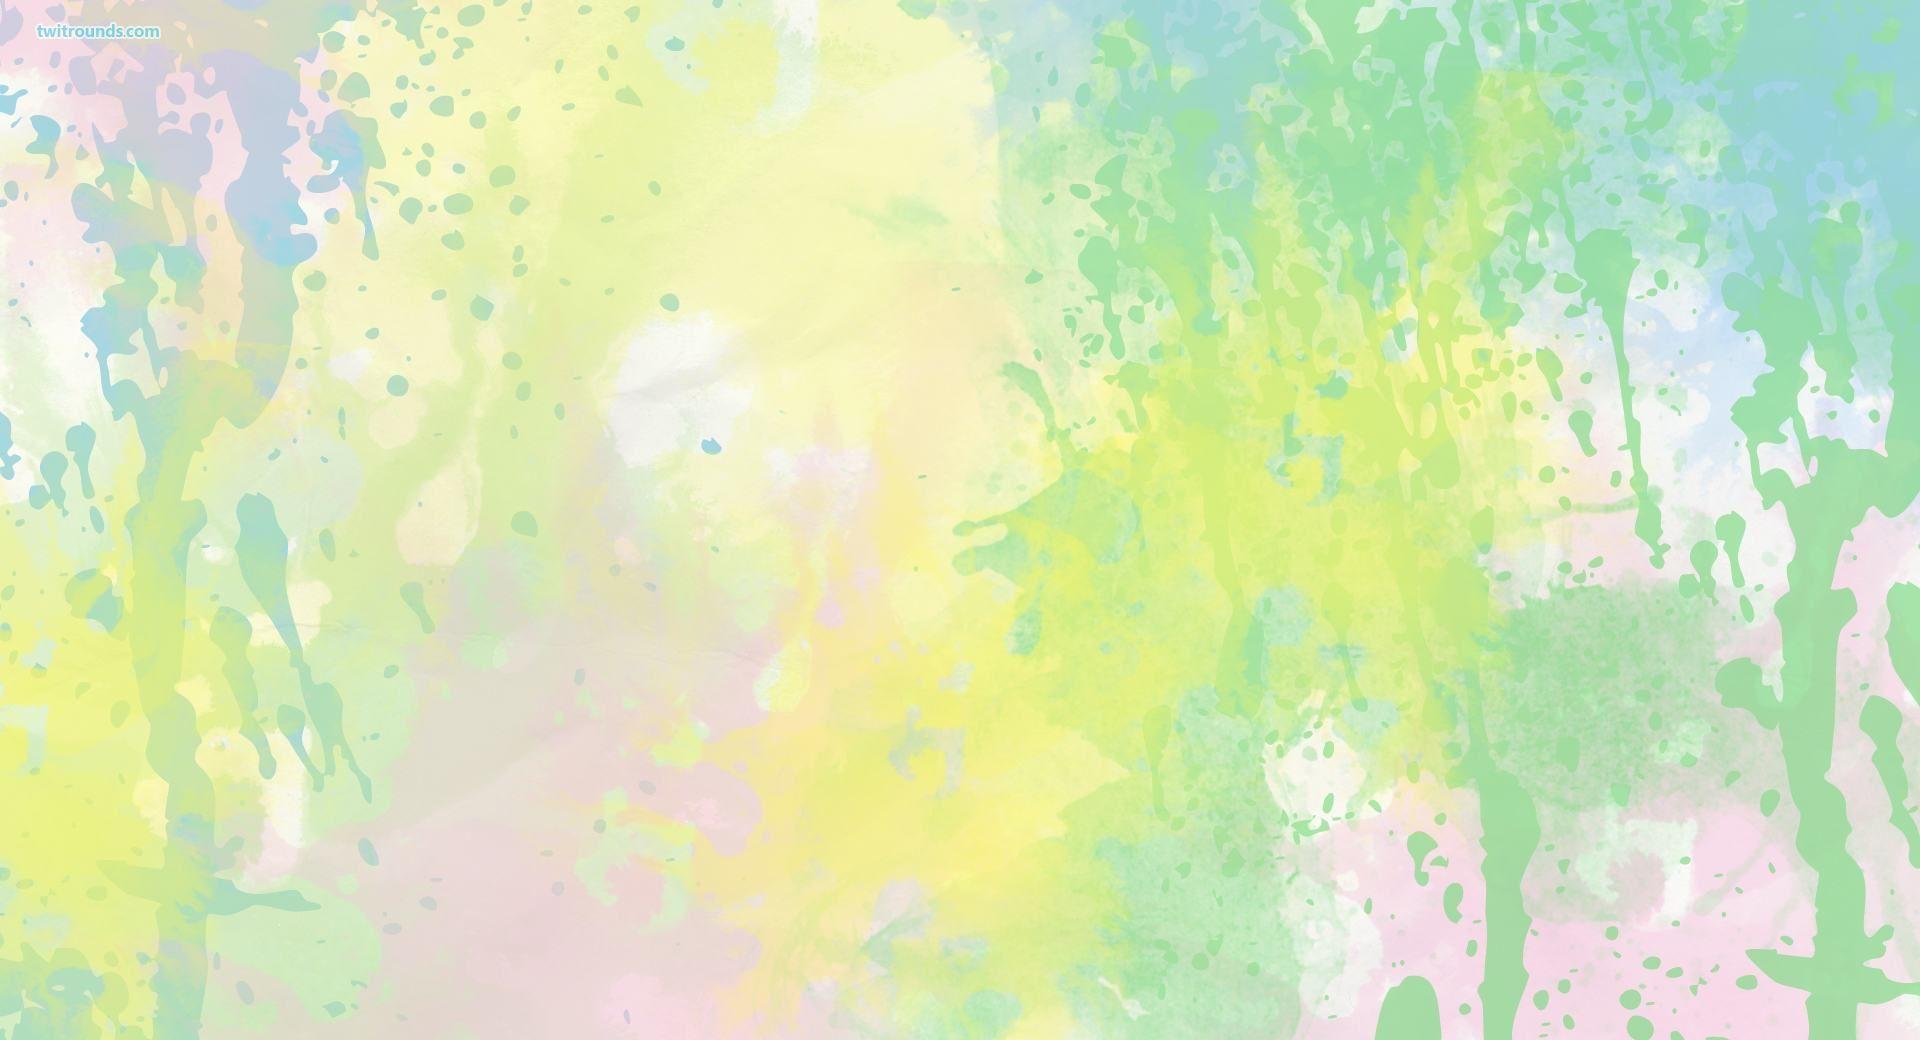 Wallpapers For > Blue Watercolor Wallpaper Fondos para